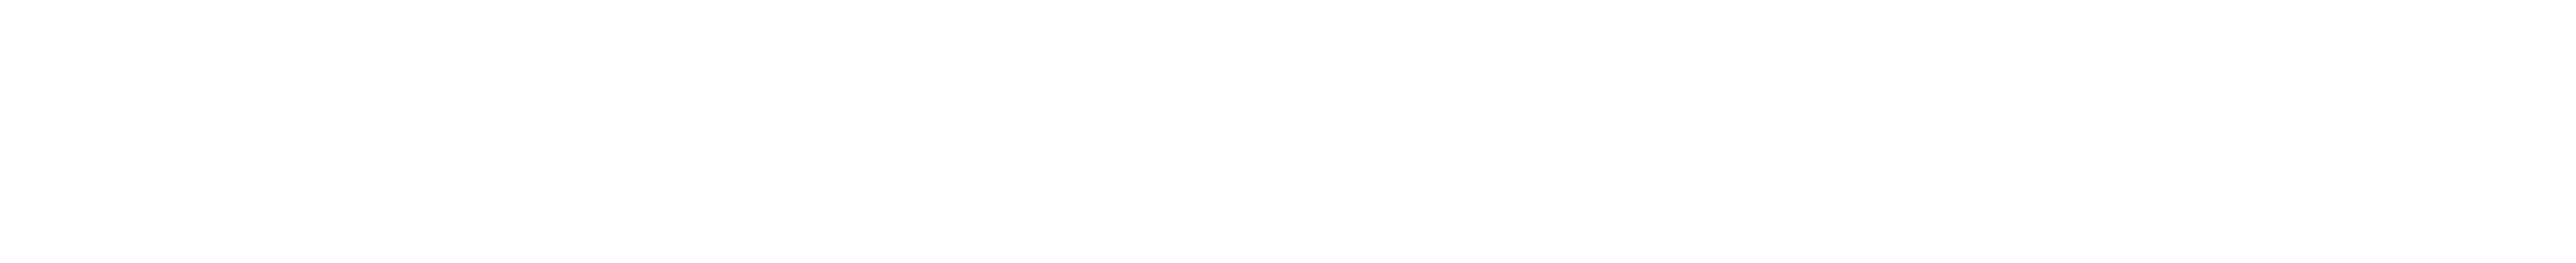 tutorocean-logo